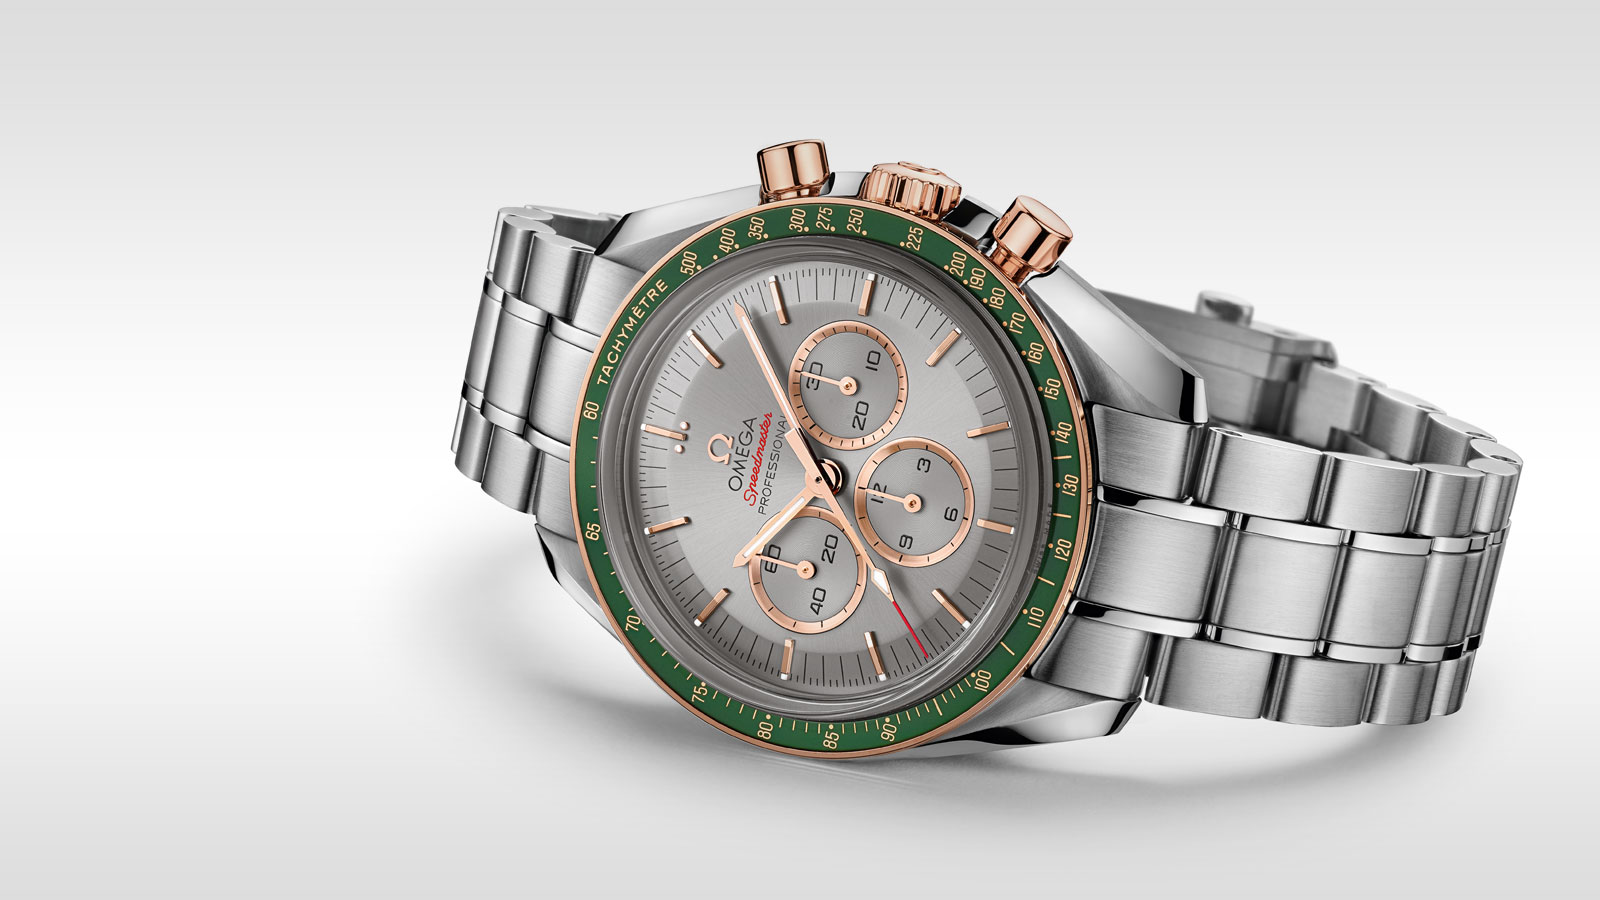 đồng hồ Speedmaster Professional Tokyo 2020 (ref. 522.20.42.30.06.001)